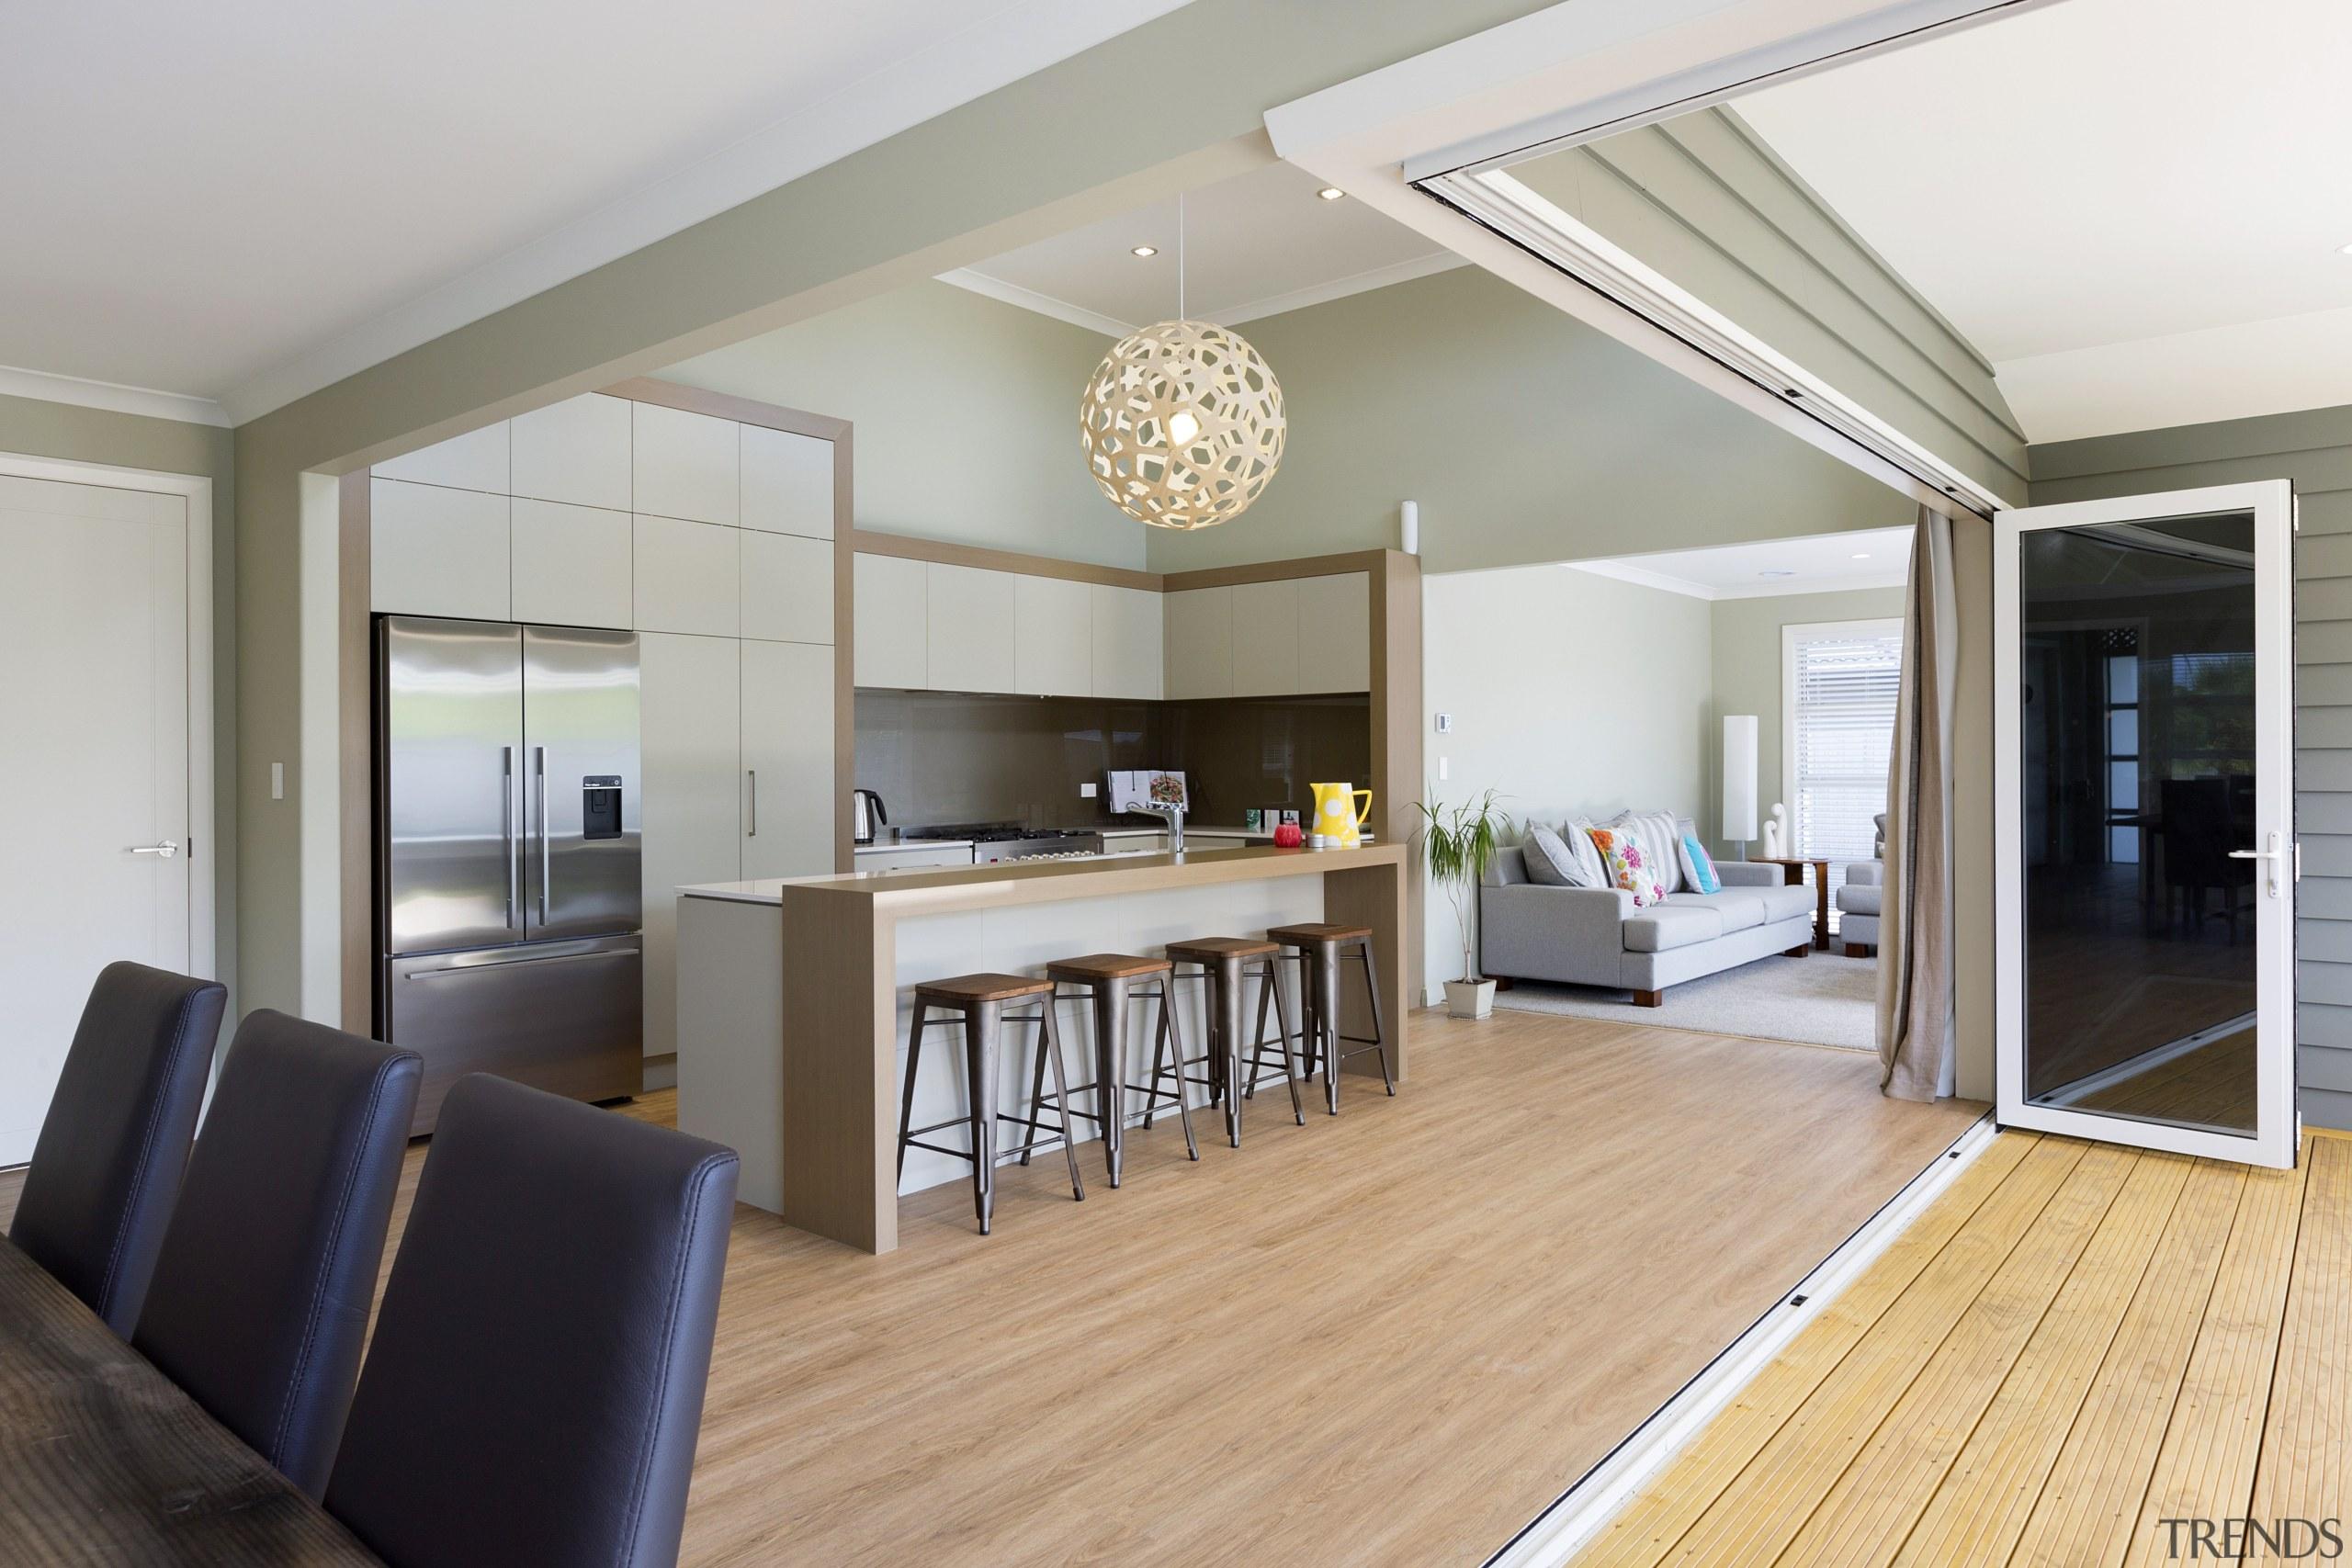 Recessed runners enhance the indoor-outdoor flow in this floor, interior design, living room, real estate, room, gray